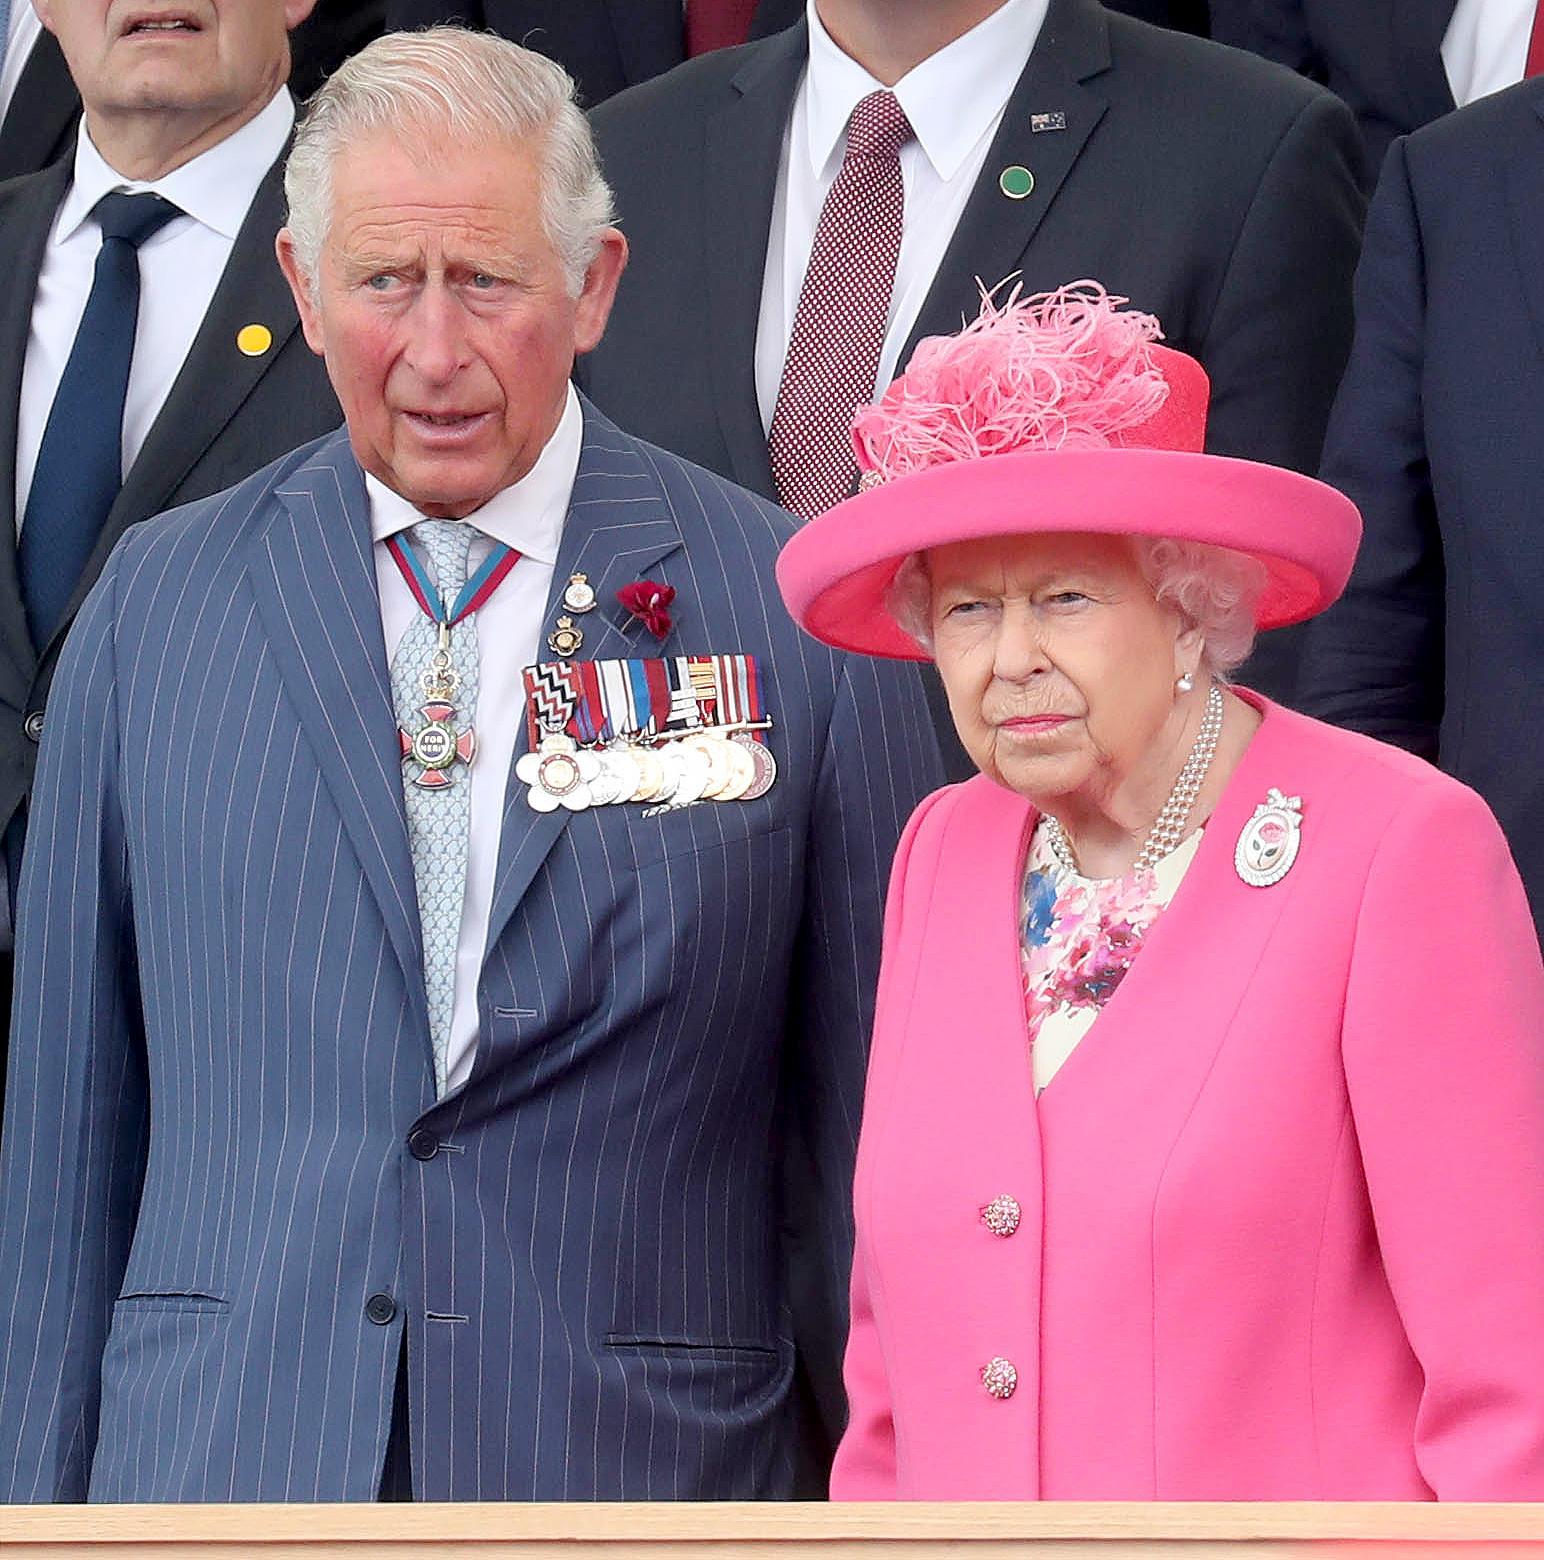 Inside Prince Charles' Plans If Queen Elizabeth Steps Down